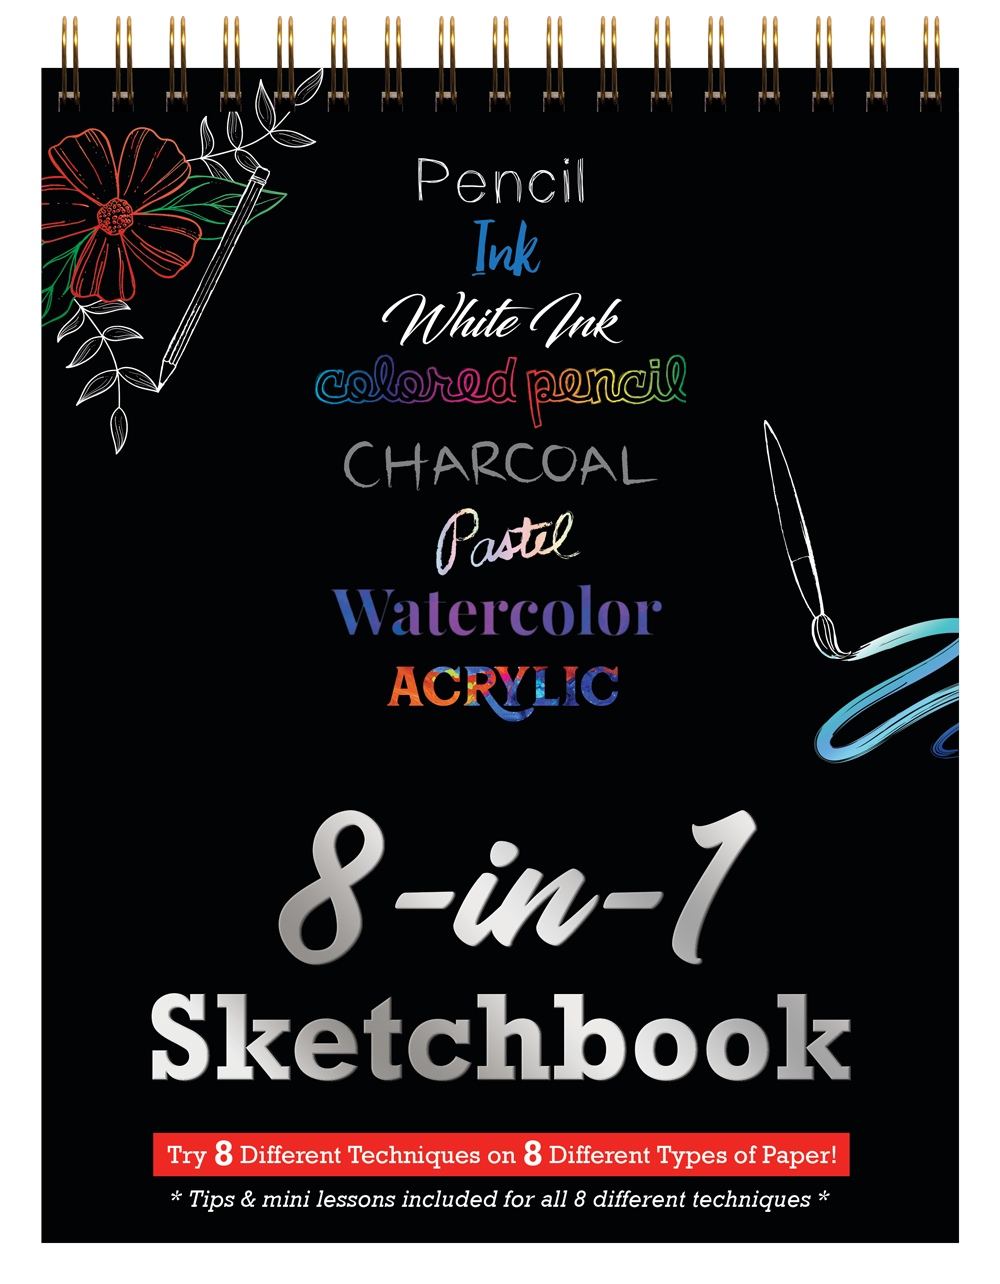 8 In 1 Sketchbook